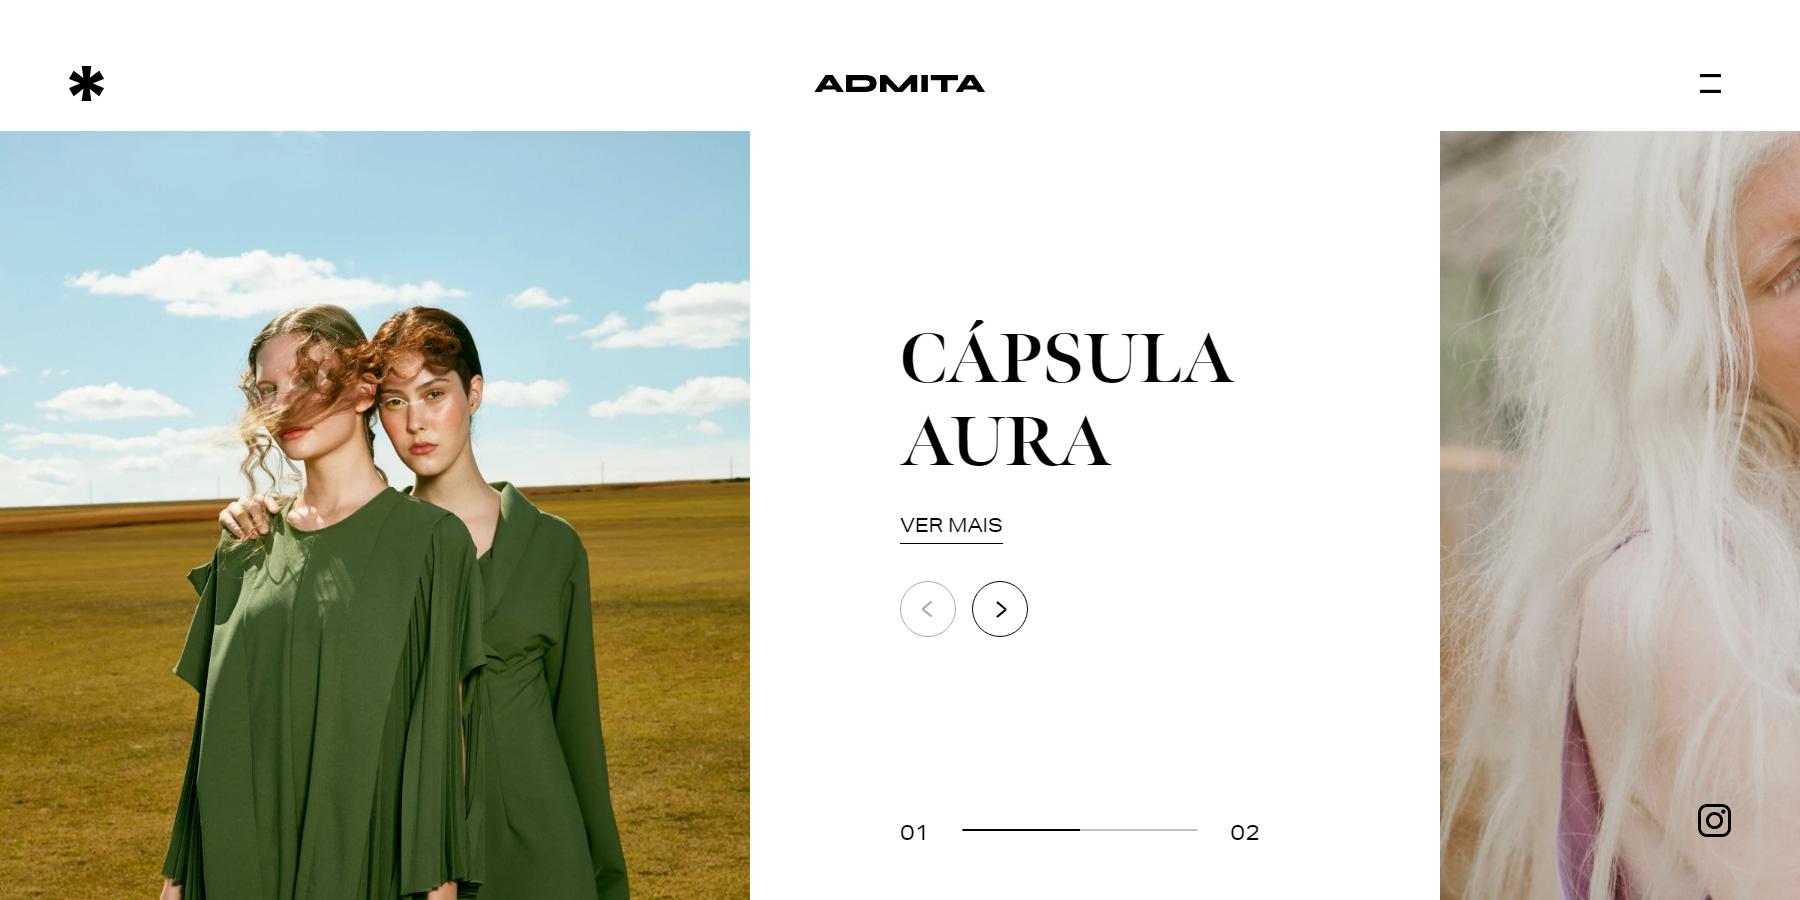 Admita - Website of the Day